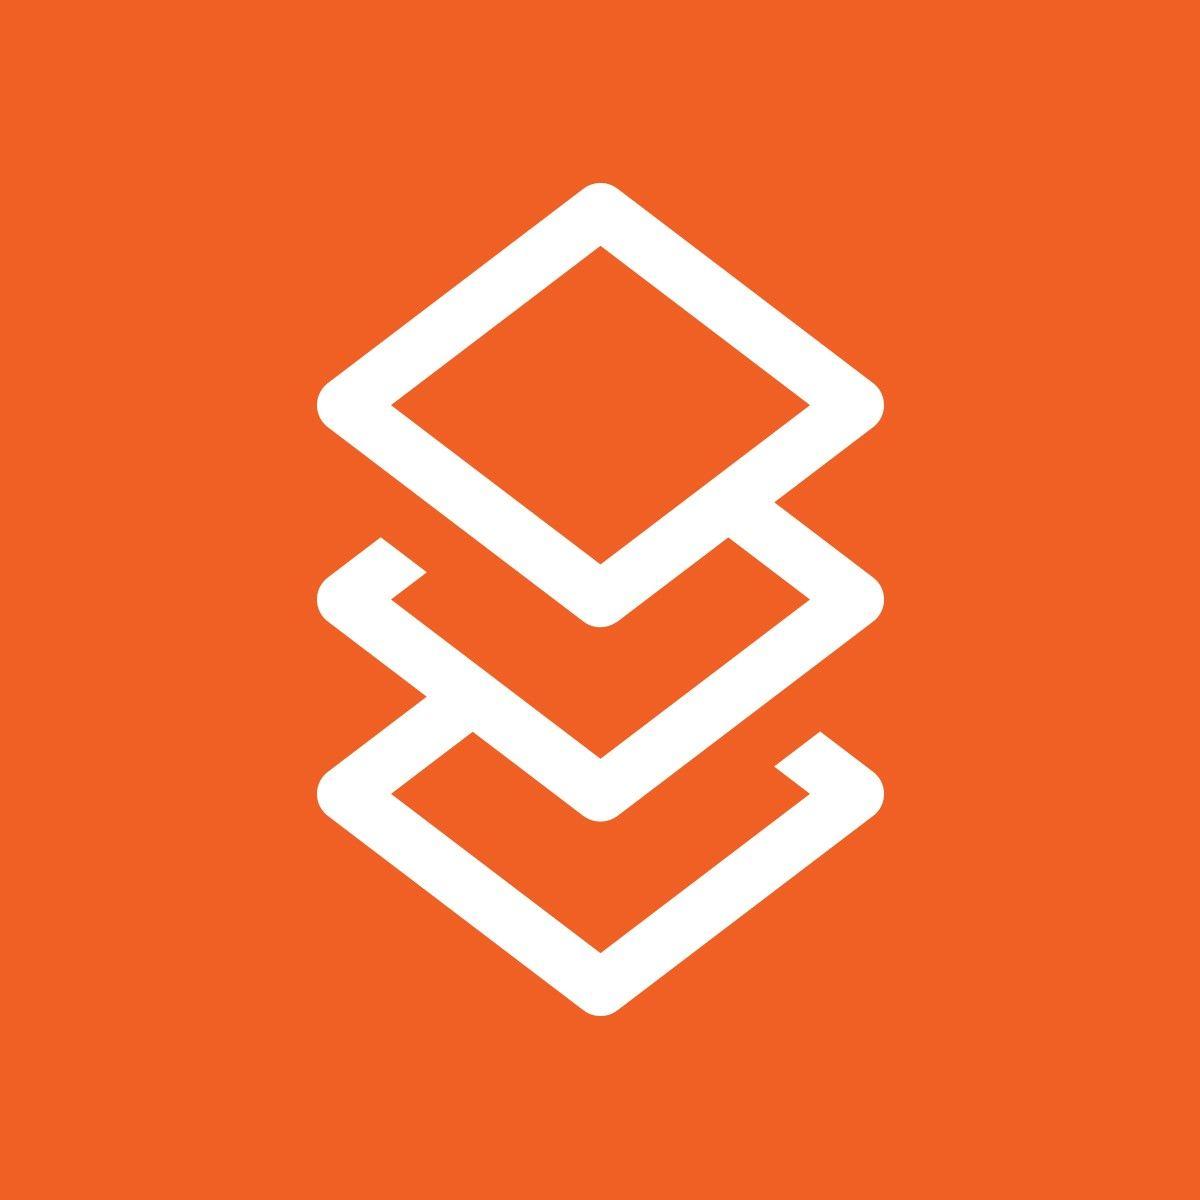 Buildify logo.